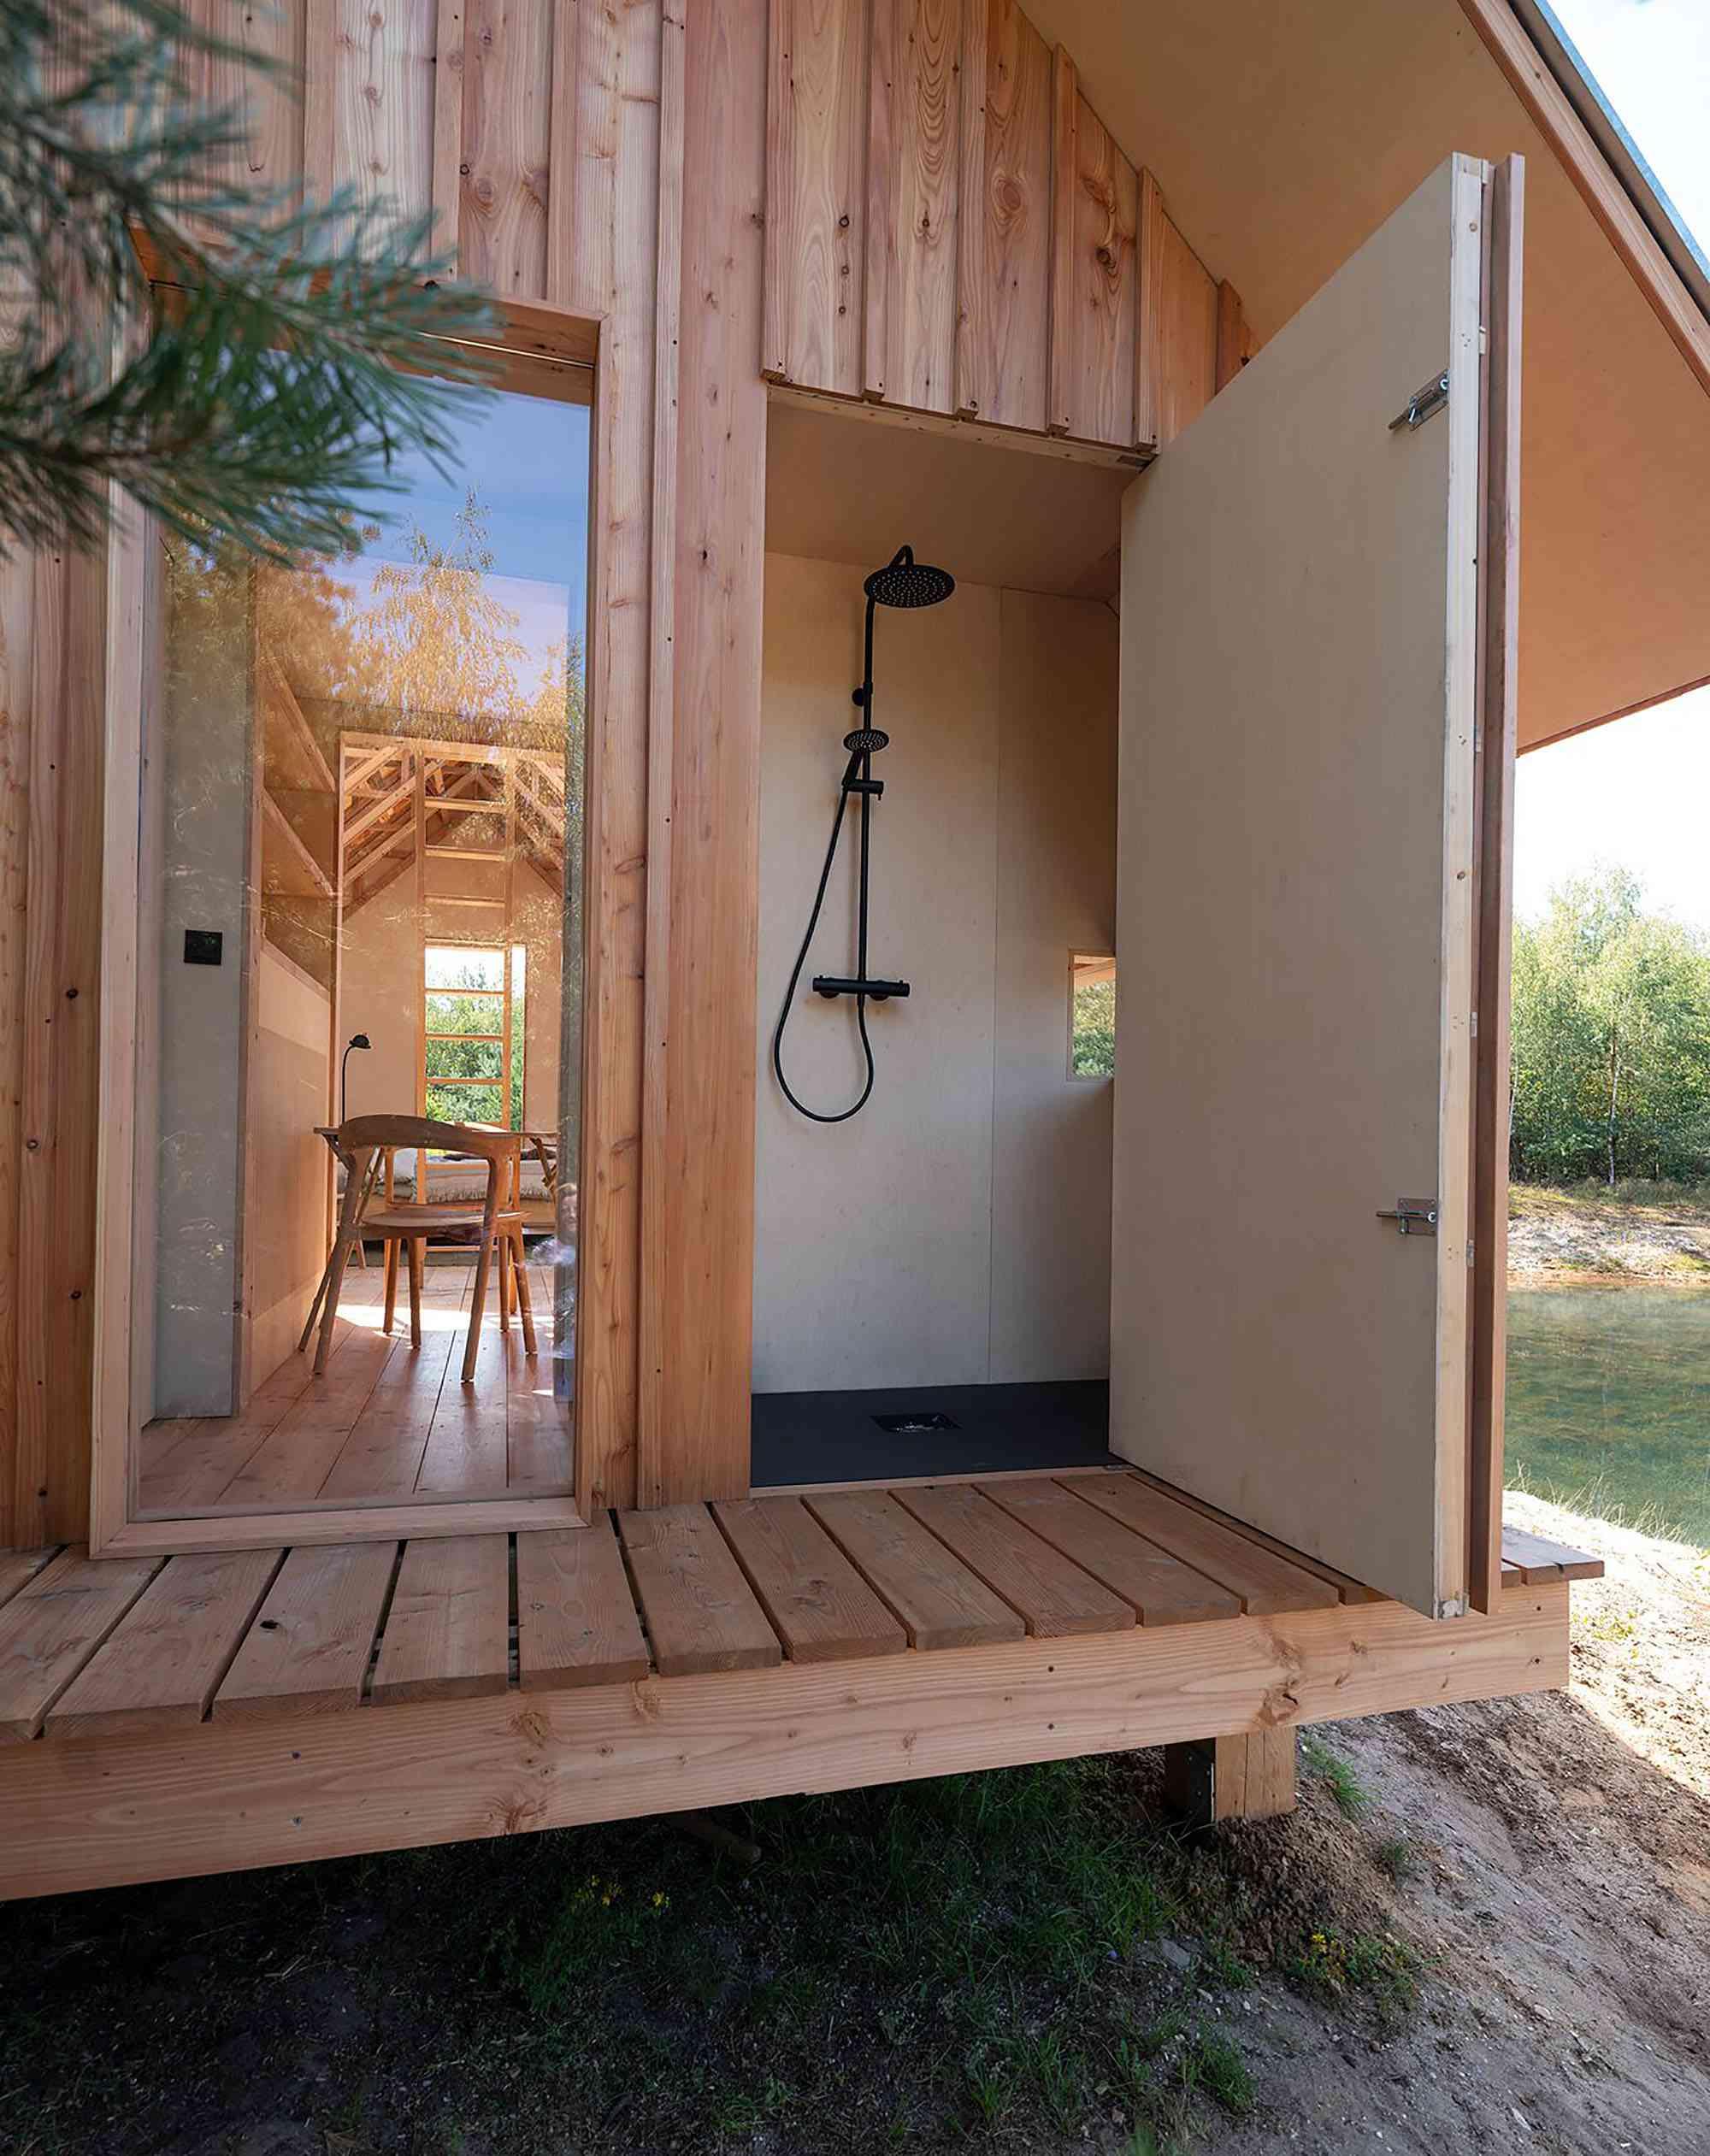 Cabin ANNA by Caspar Schols bathroom